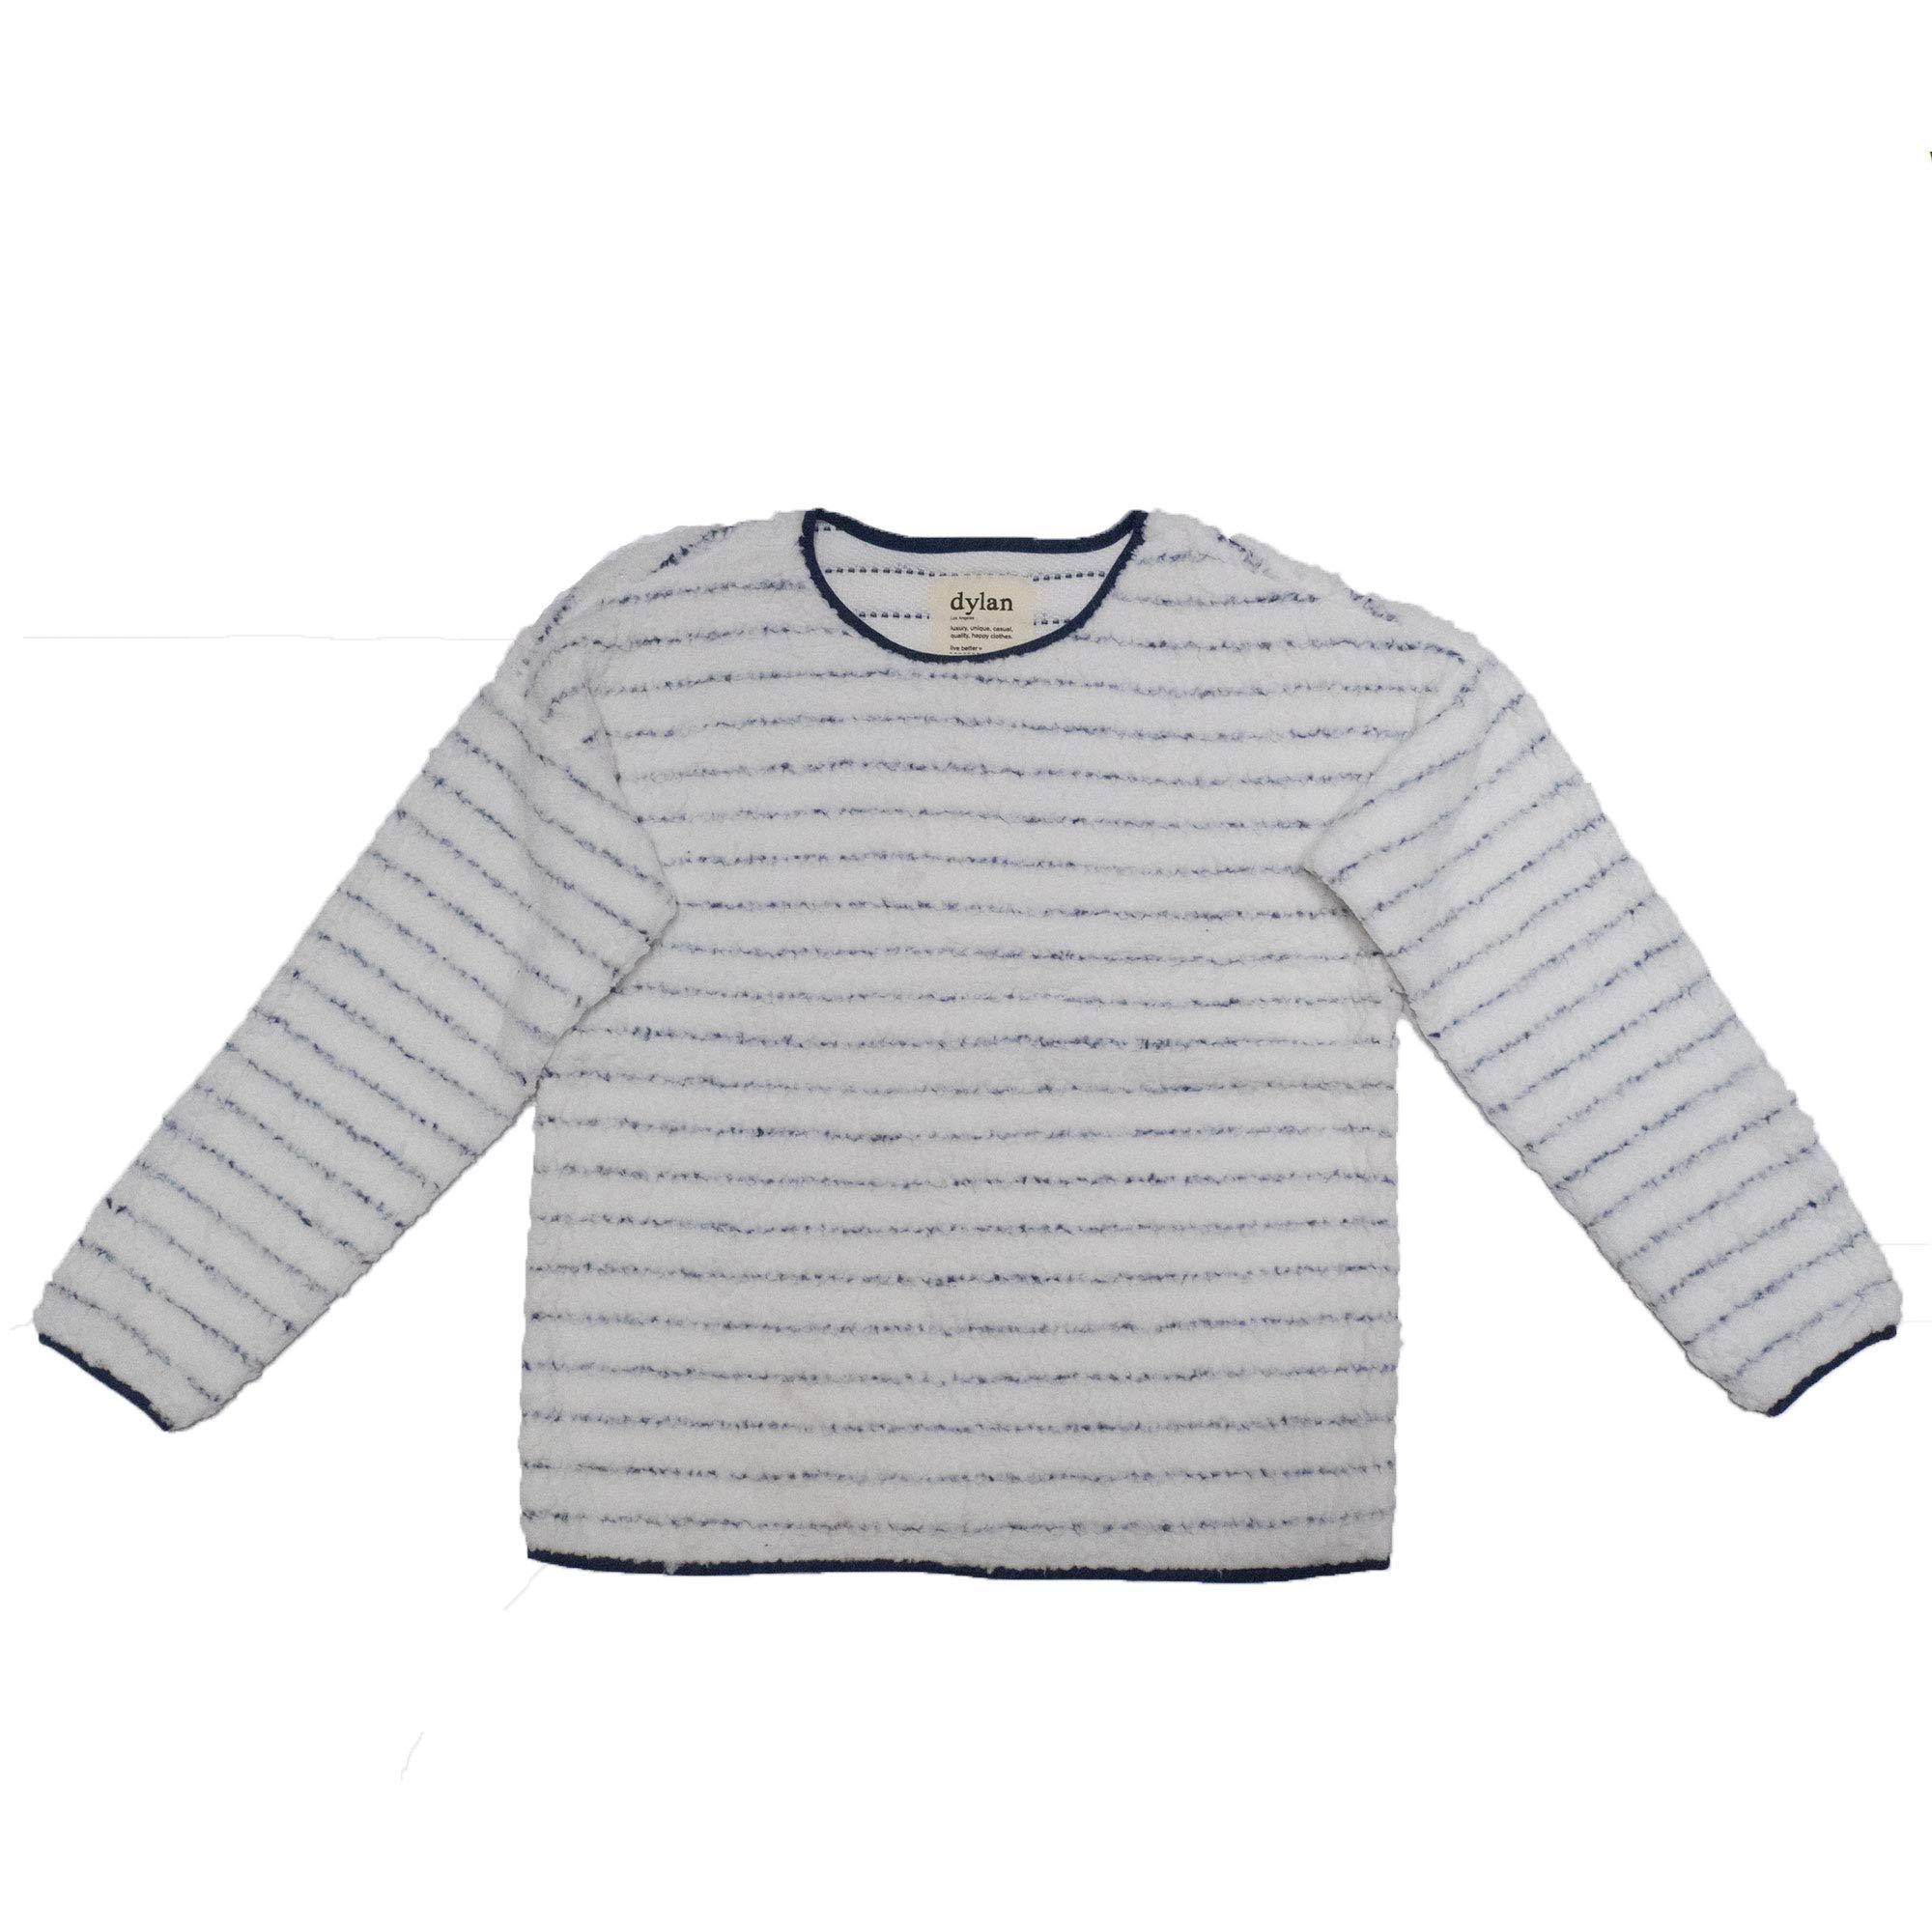 Dylan Women's Classic Stripe Drop Shoulder Crew Long Sleeve Top, White, X-Large